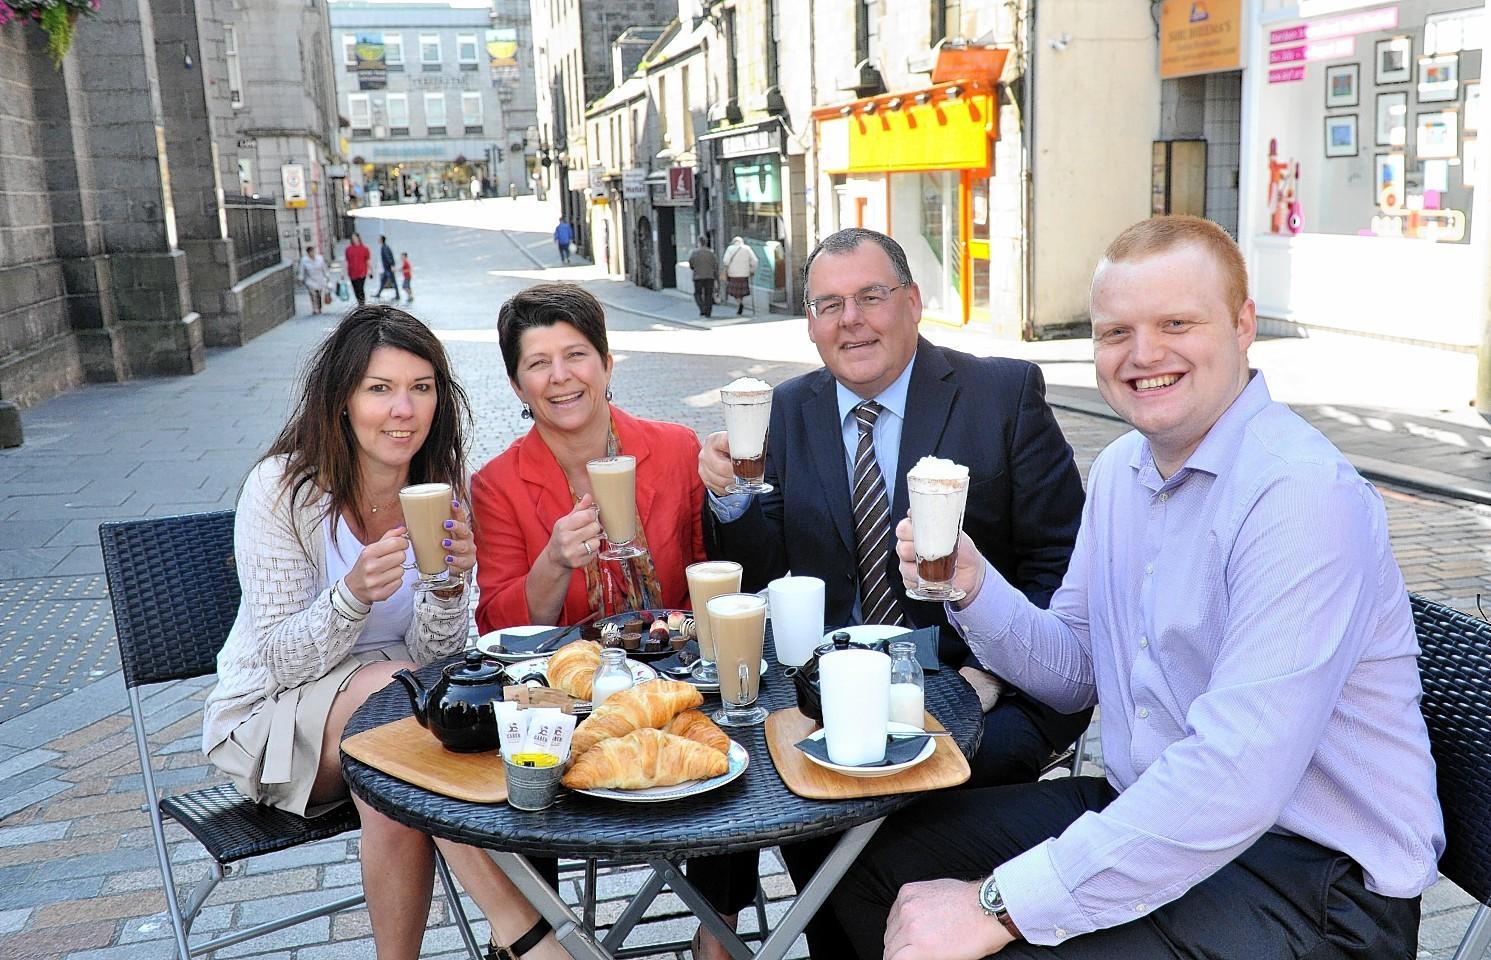 Angela Kozak, director at Cup Tea Salon, Councillor Marie Boulton, Aberdeen Inspired chief executive Gary Craig and Jamie Hutcheon, Director of Cocoa Ooze